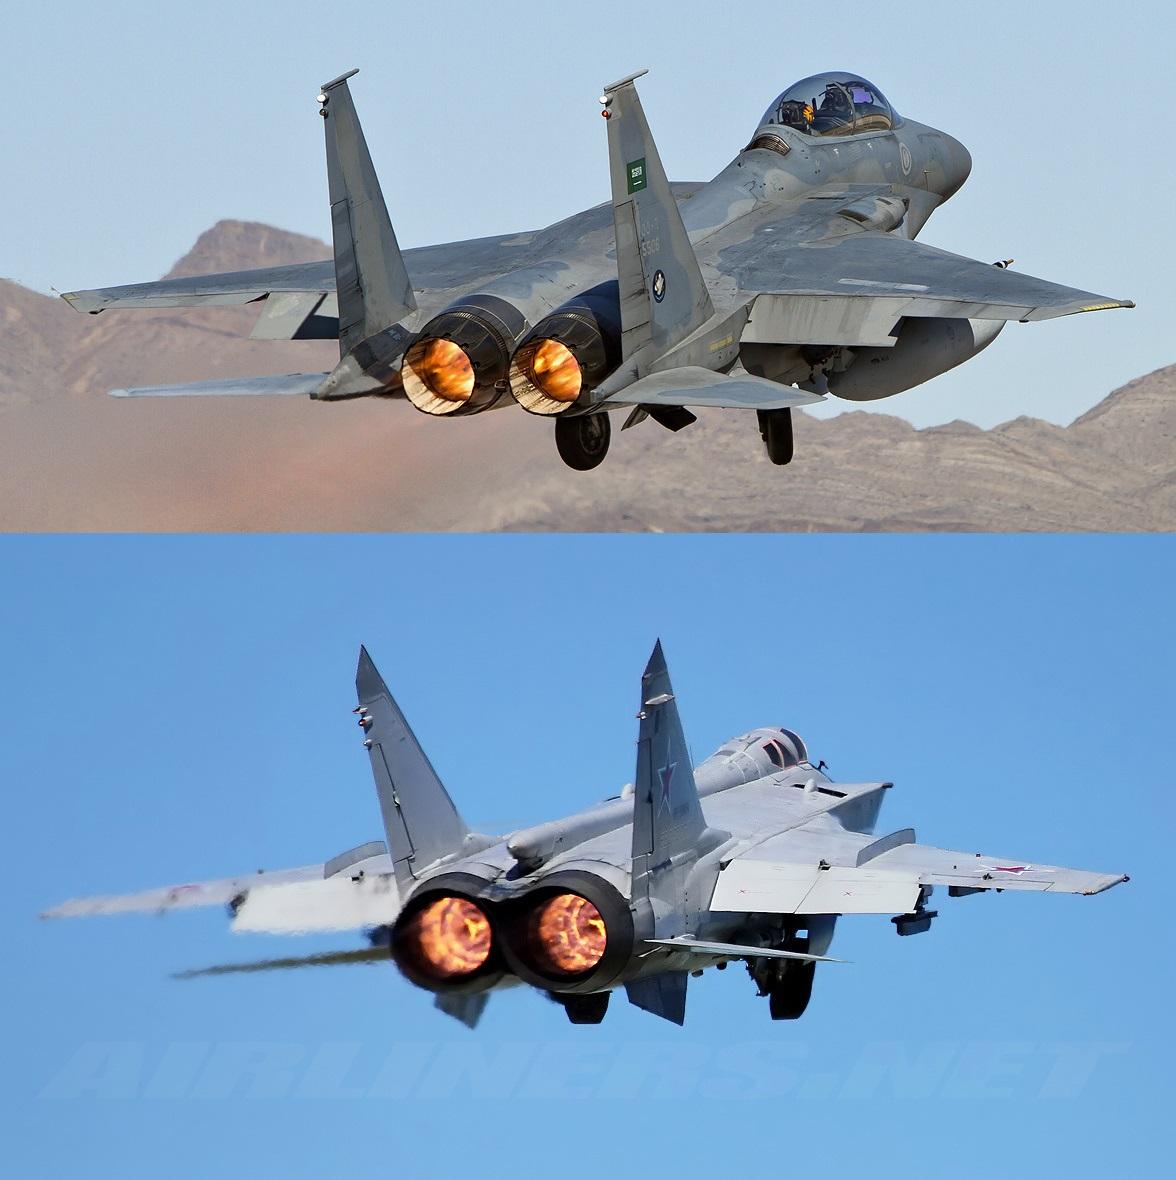 Copias descaradas de proyectos militares. 10